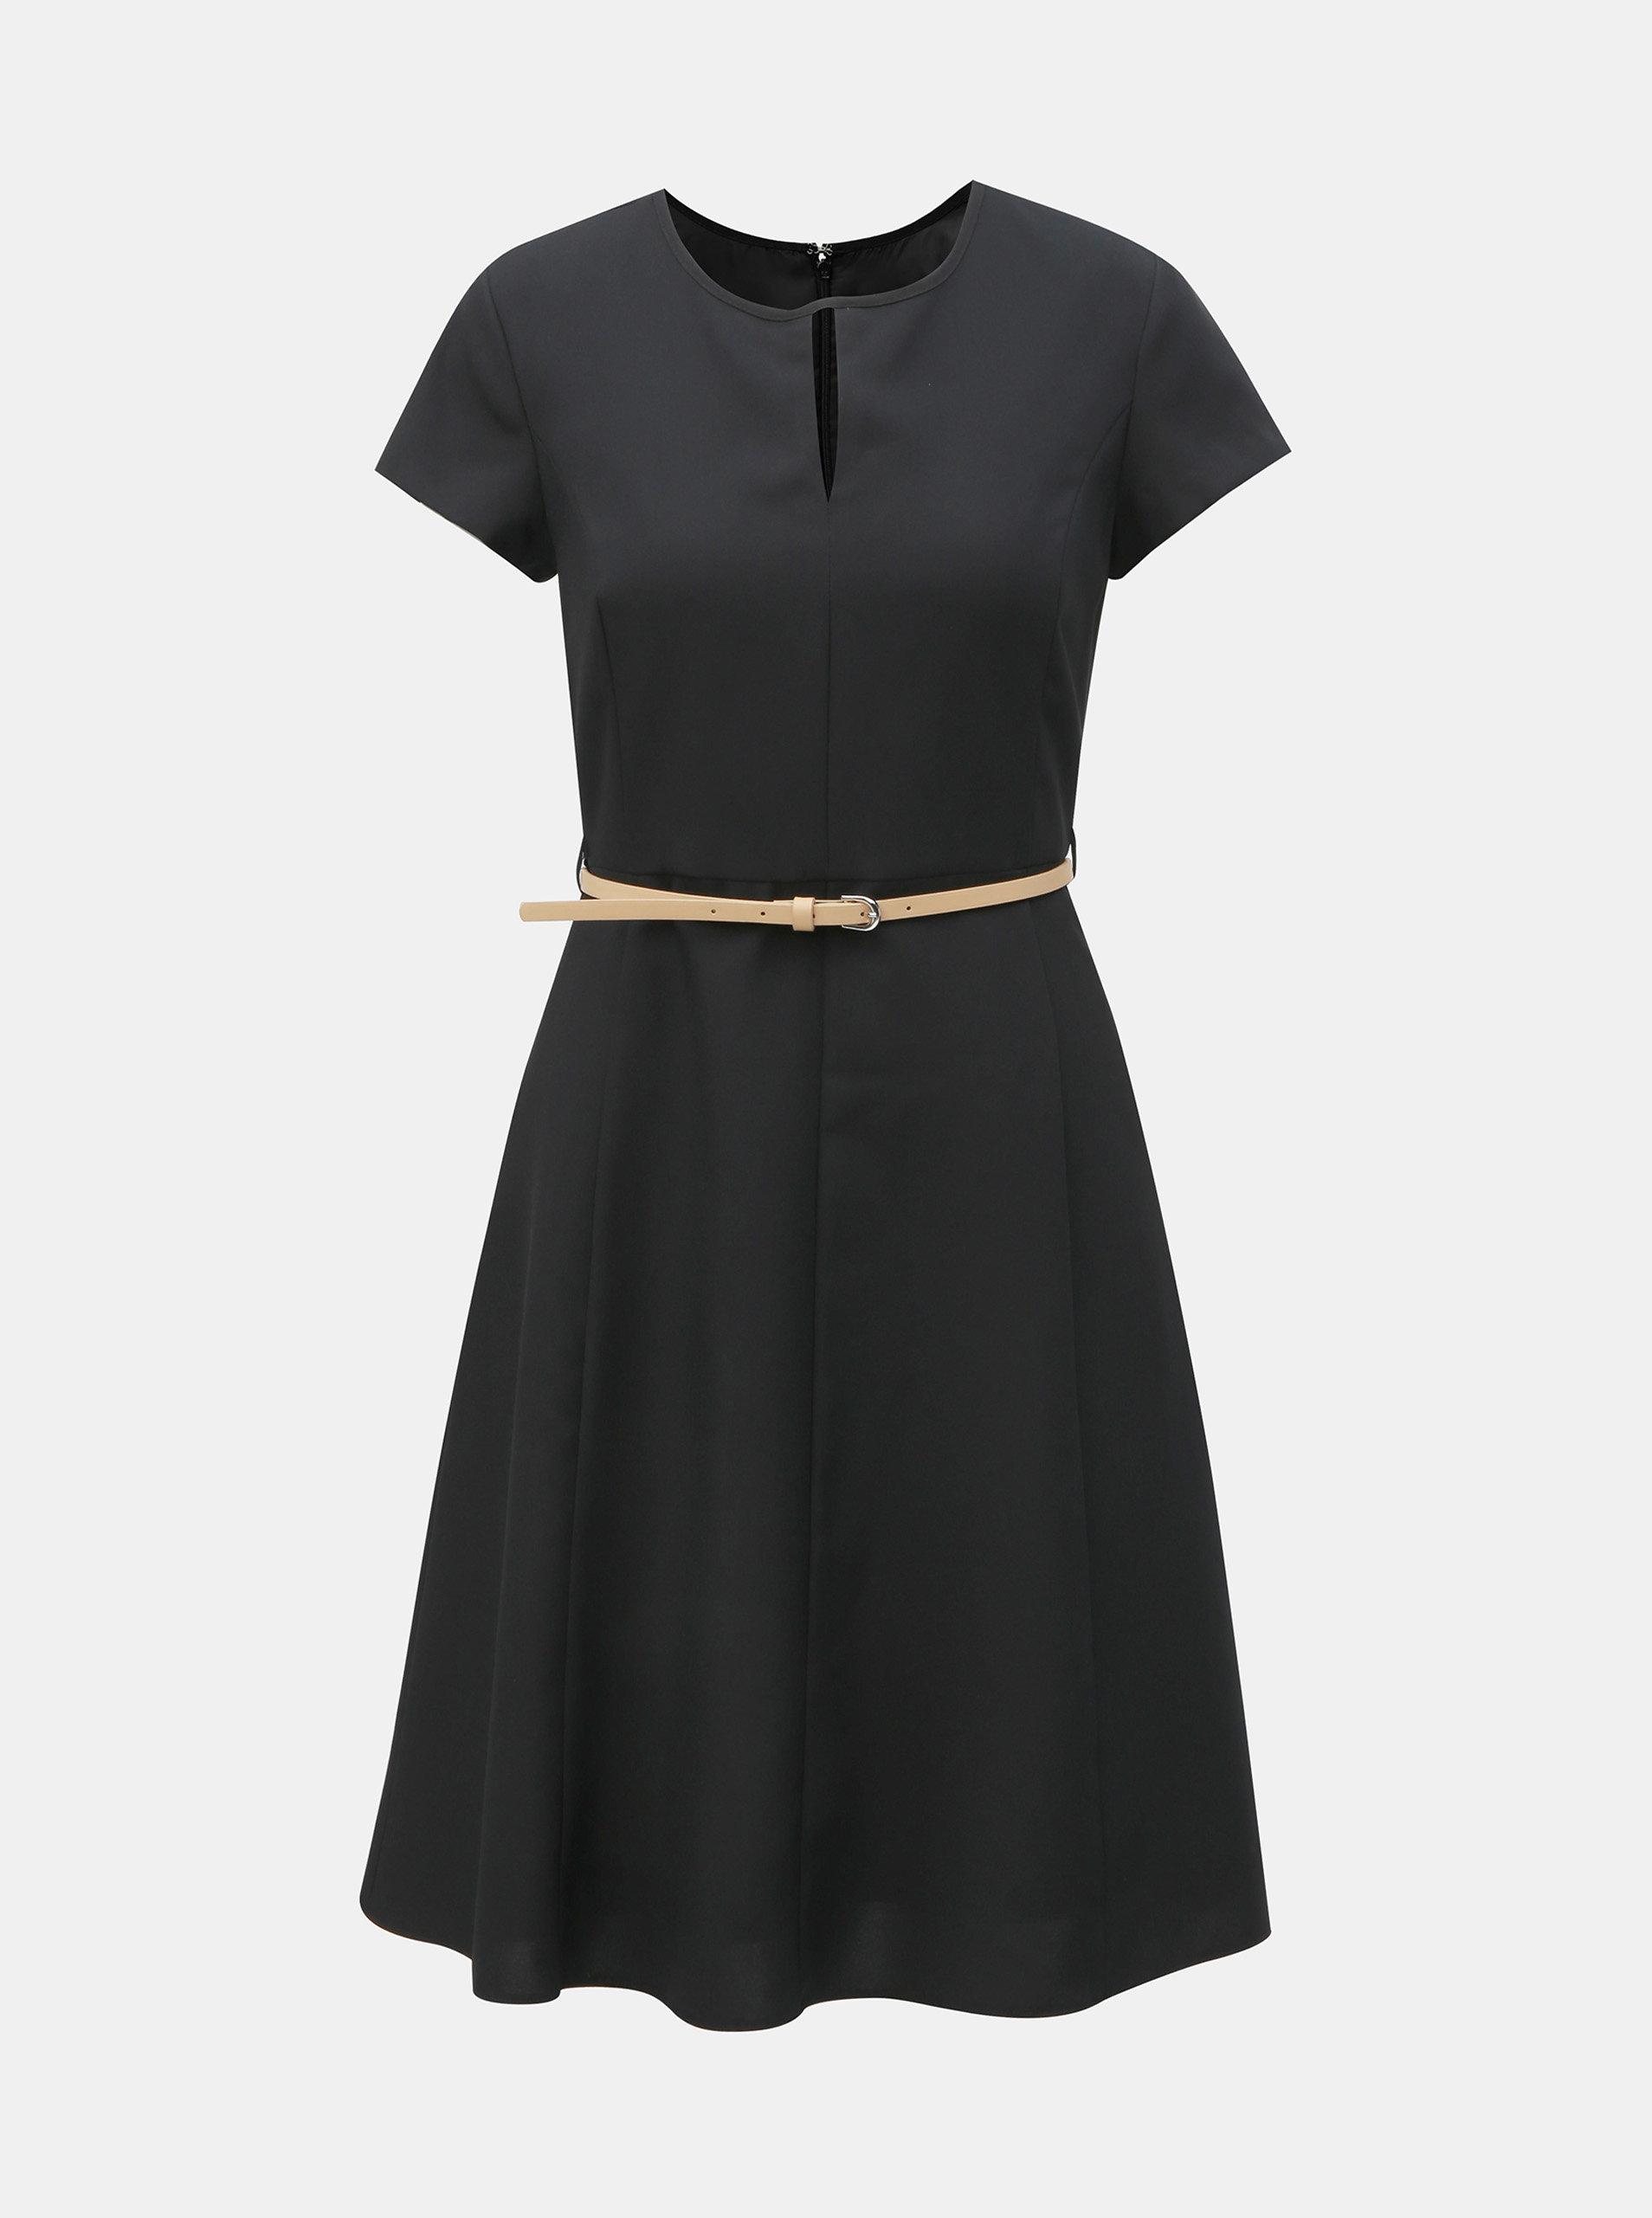 653d86f177a4 Čierne šaty s opaskom Dorothy Perkins ...